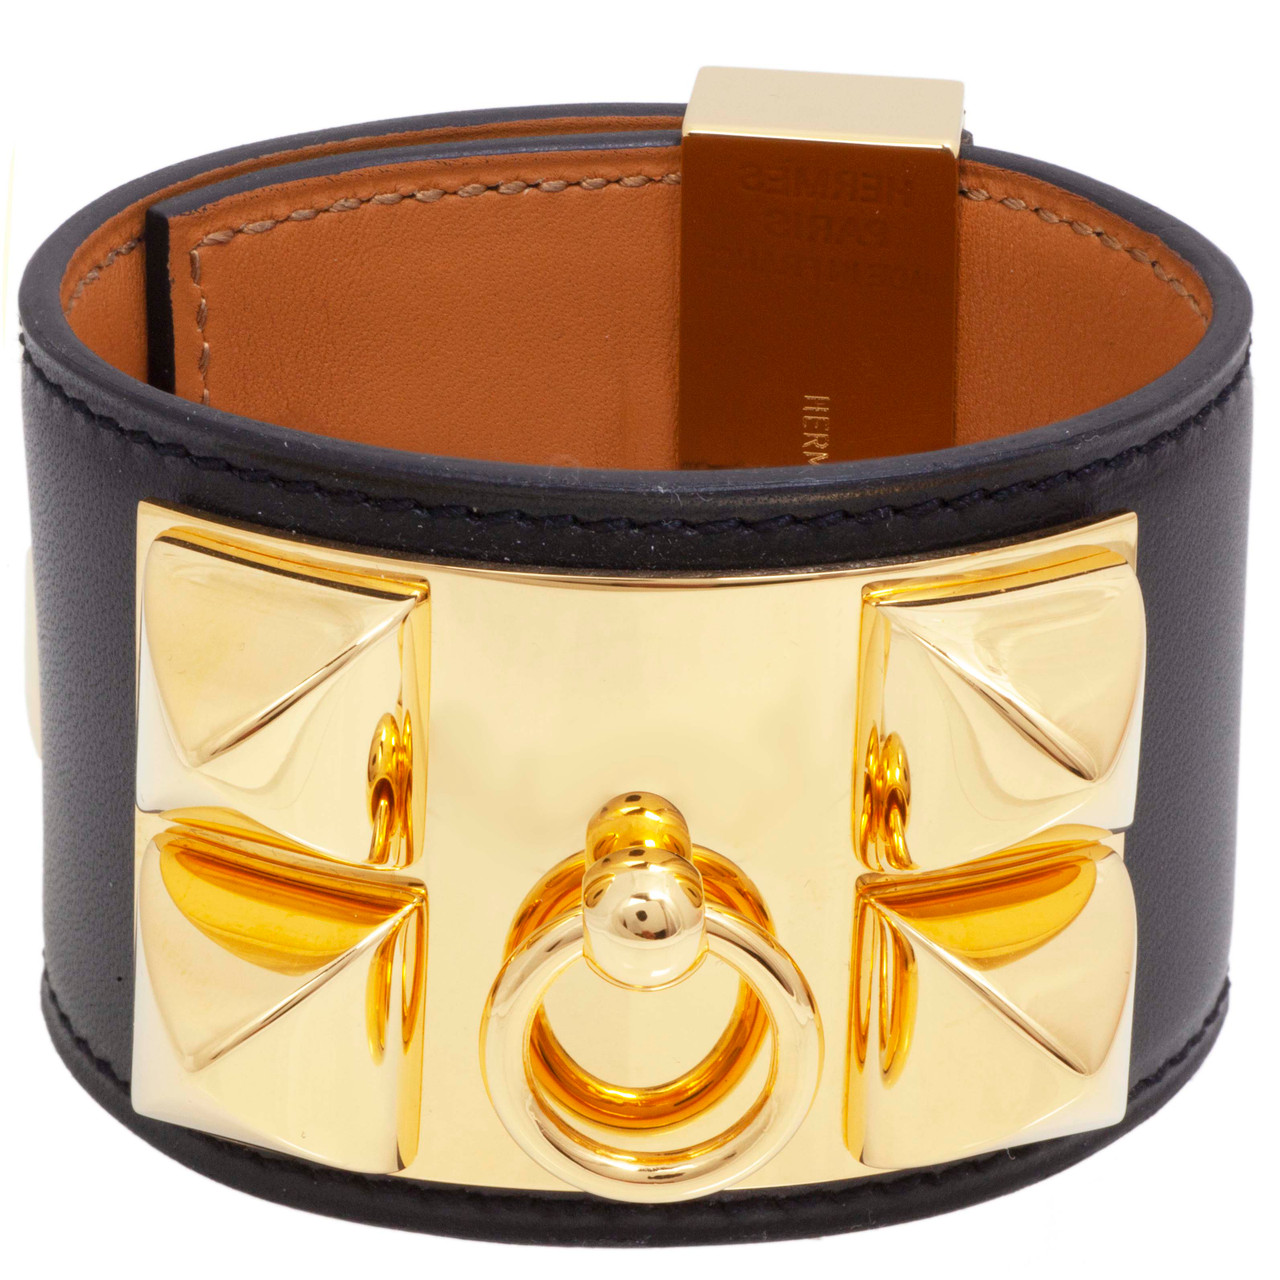 a2b81a37181 Hermes Black Box Calfskin Collier de Chien Bracelet - modaselle